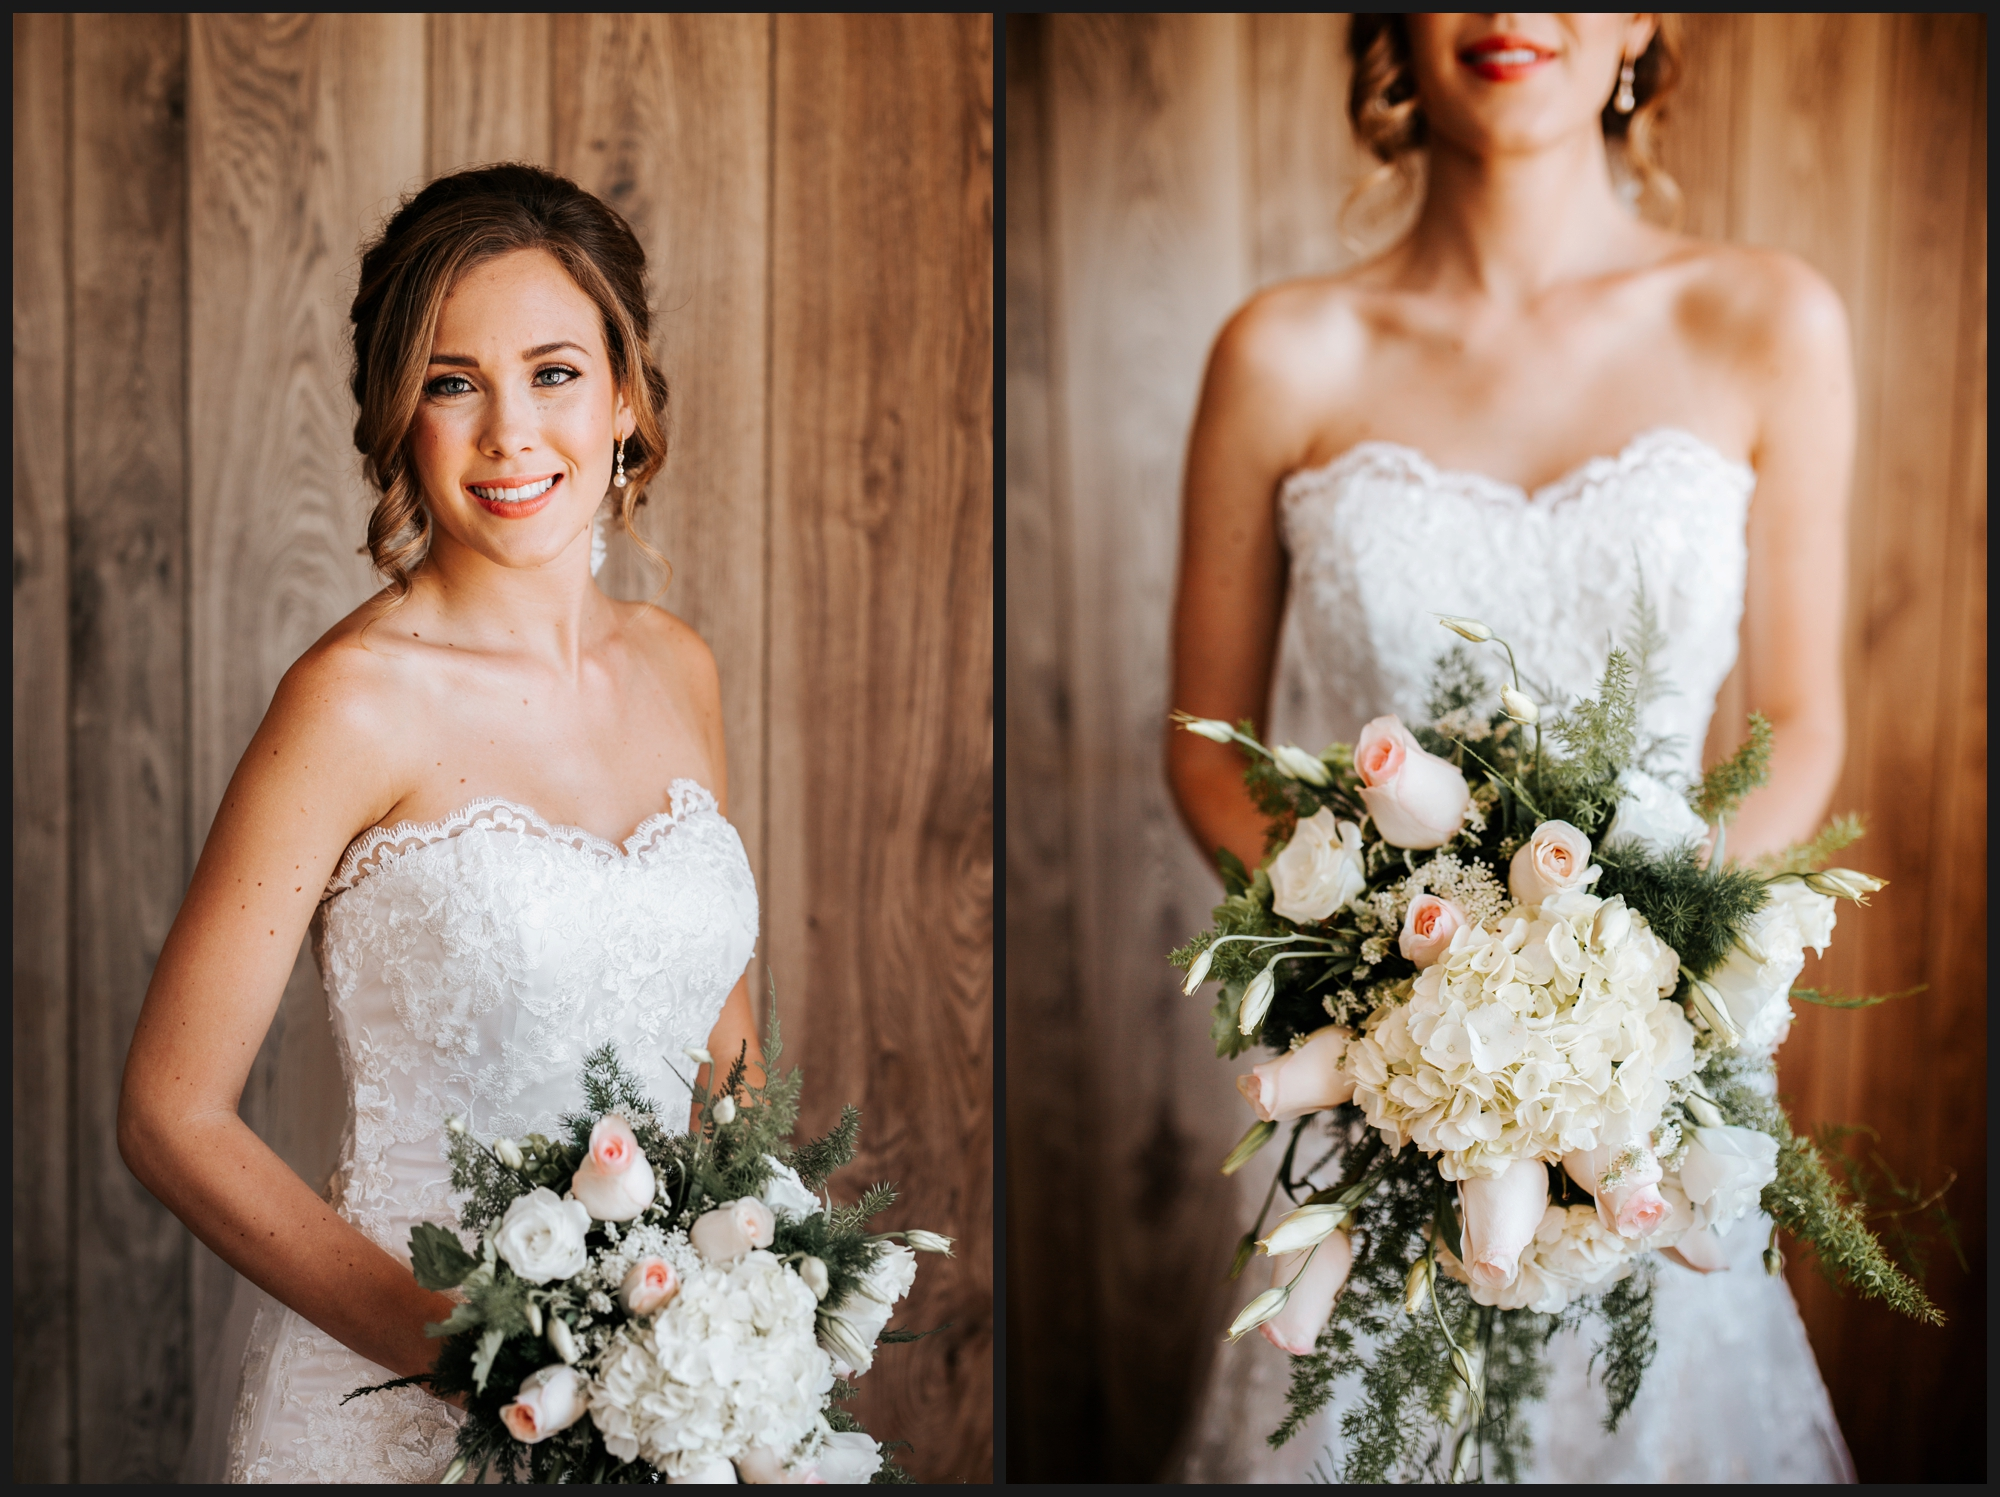 Orlando-Wedding-Photographer-destination-wedding-photographer-florida-wedding-photographer-bohemian-wedding-photographer_0015.jpg